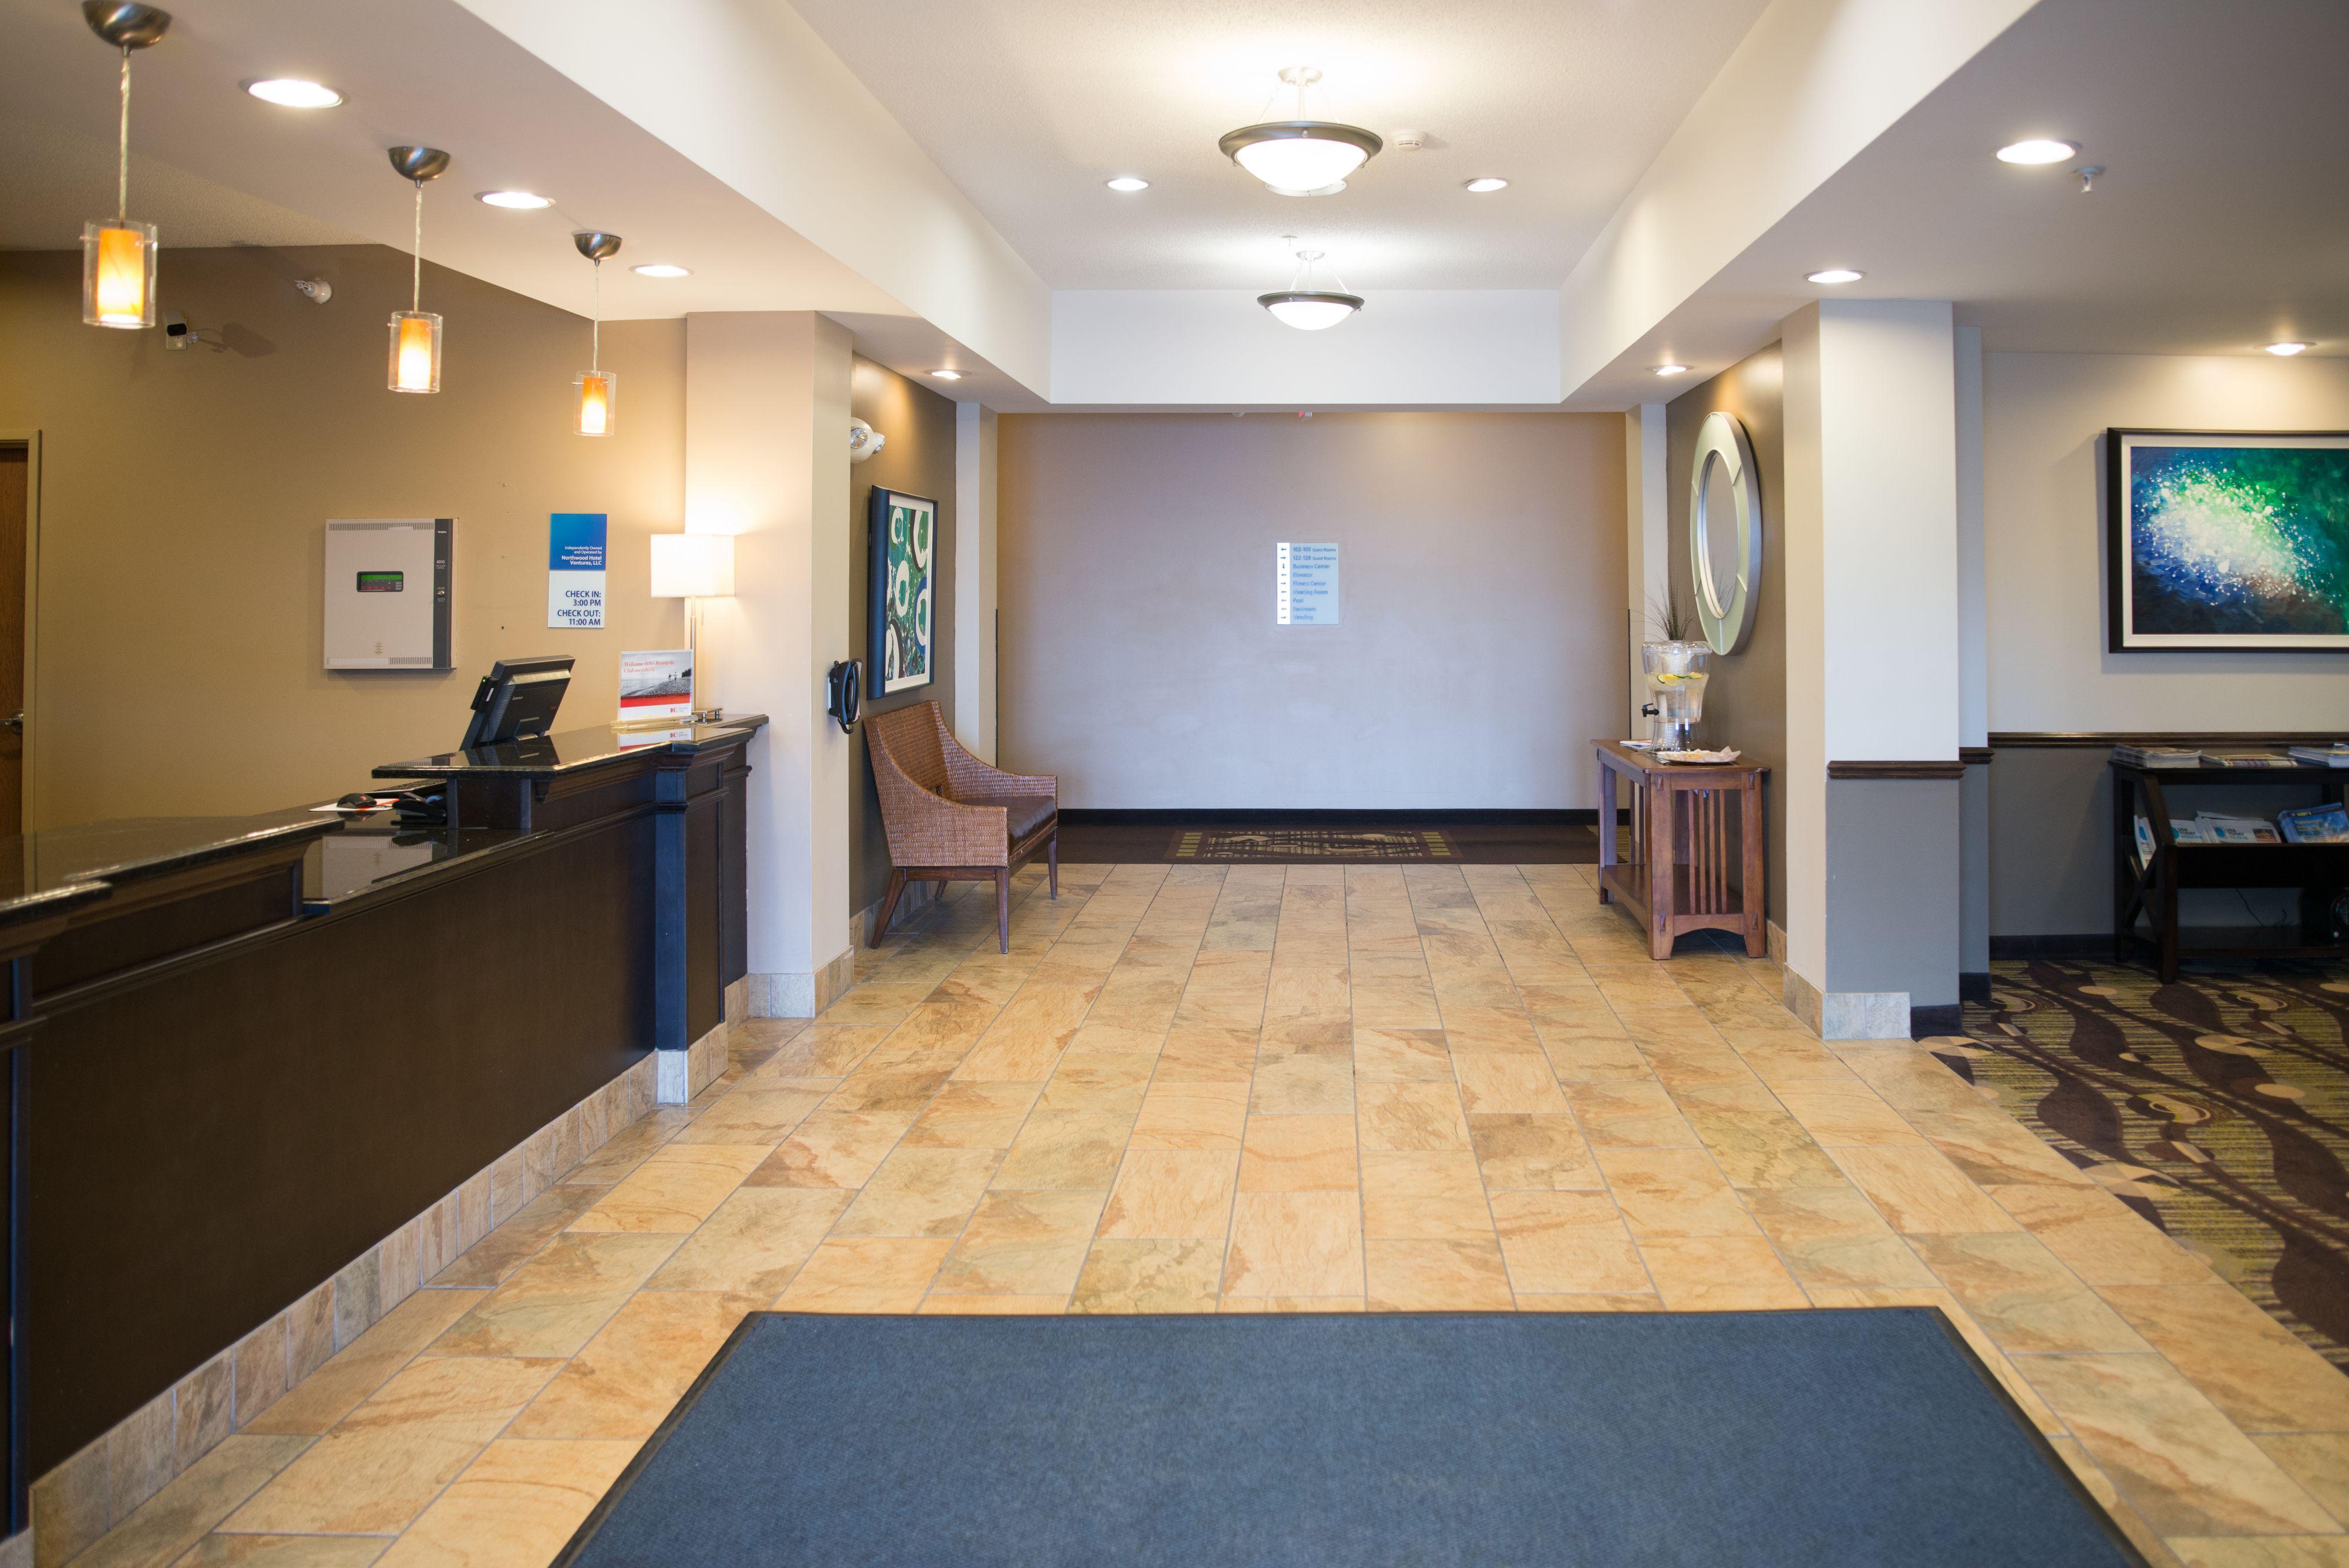 Holiday Inn Express & Suites Northwood image 4